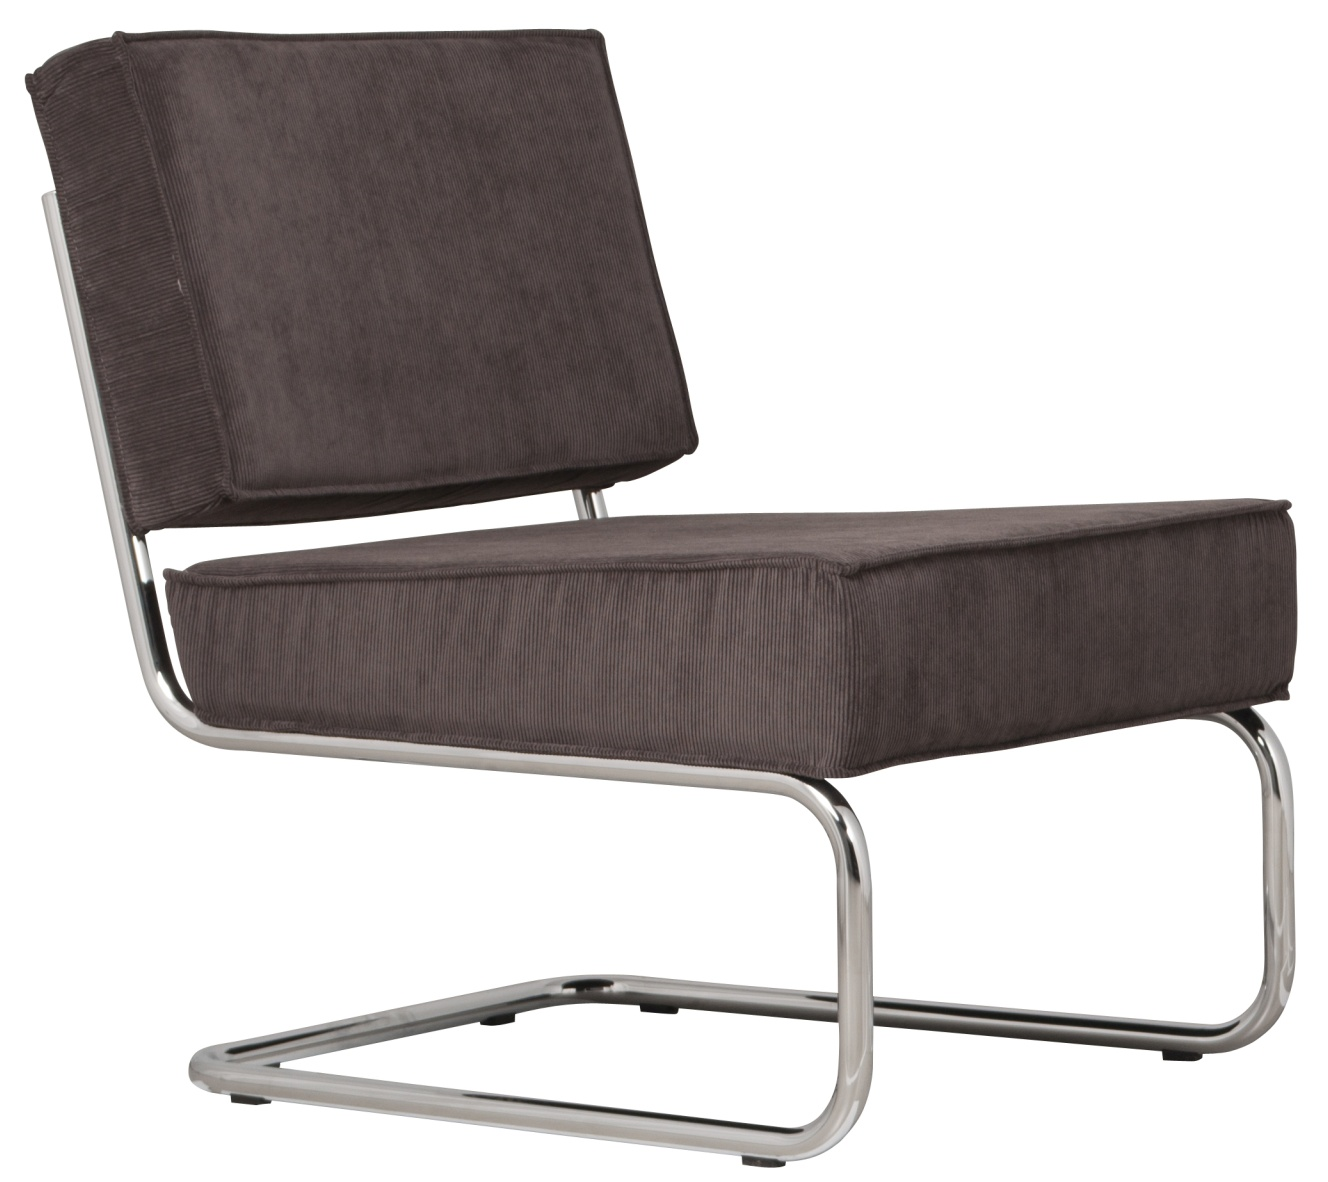 Zuiver lounge chair ridge rib fauteuil zuiver in de aanbieding kopen - Lounge design grijs ...